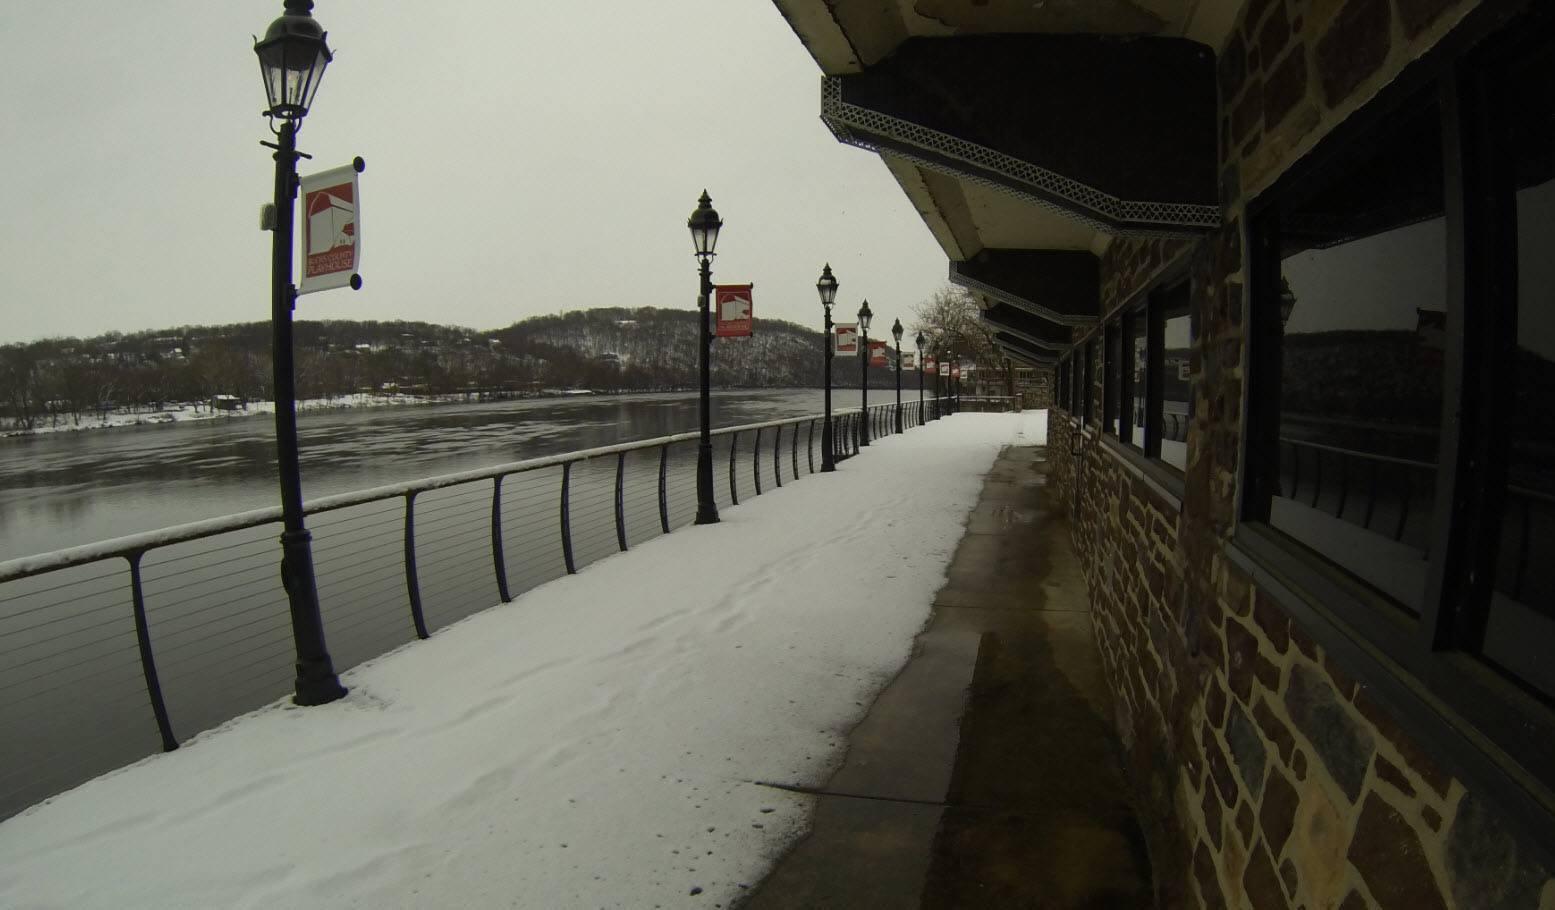 Snowy view of Deleware river